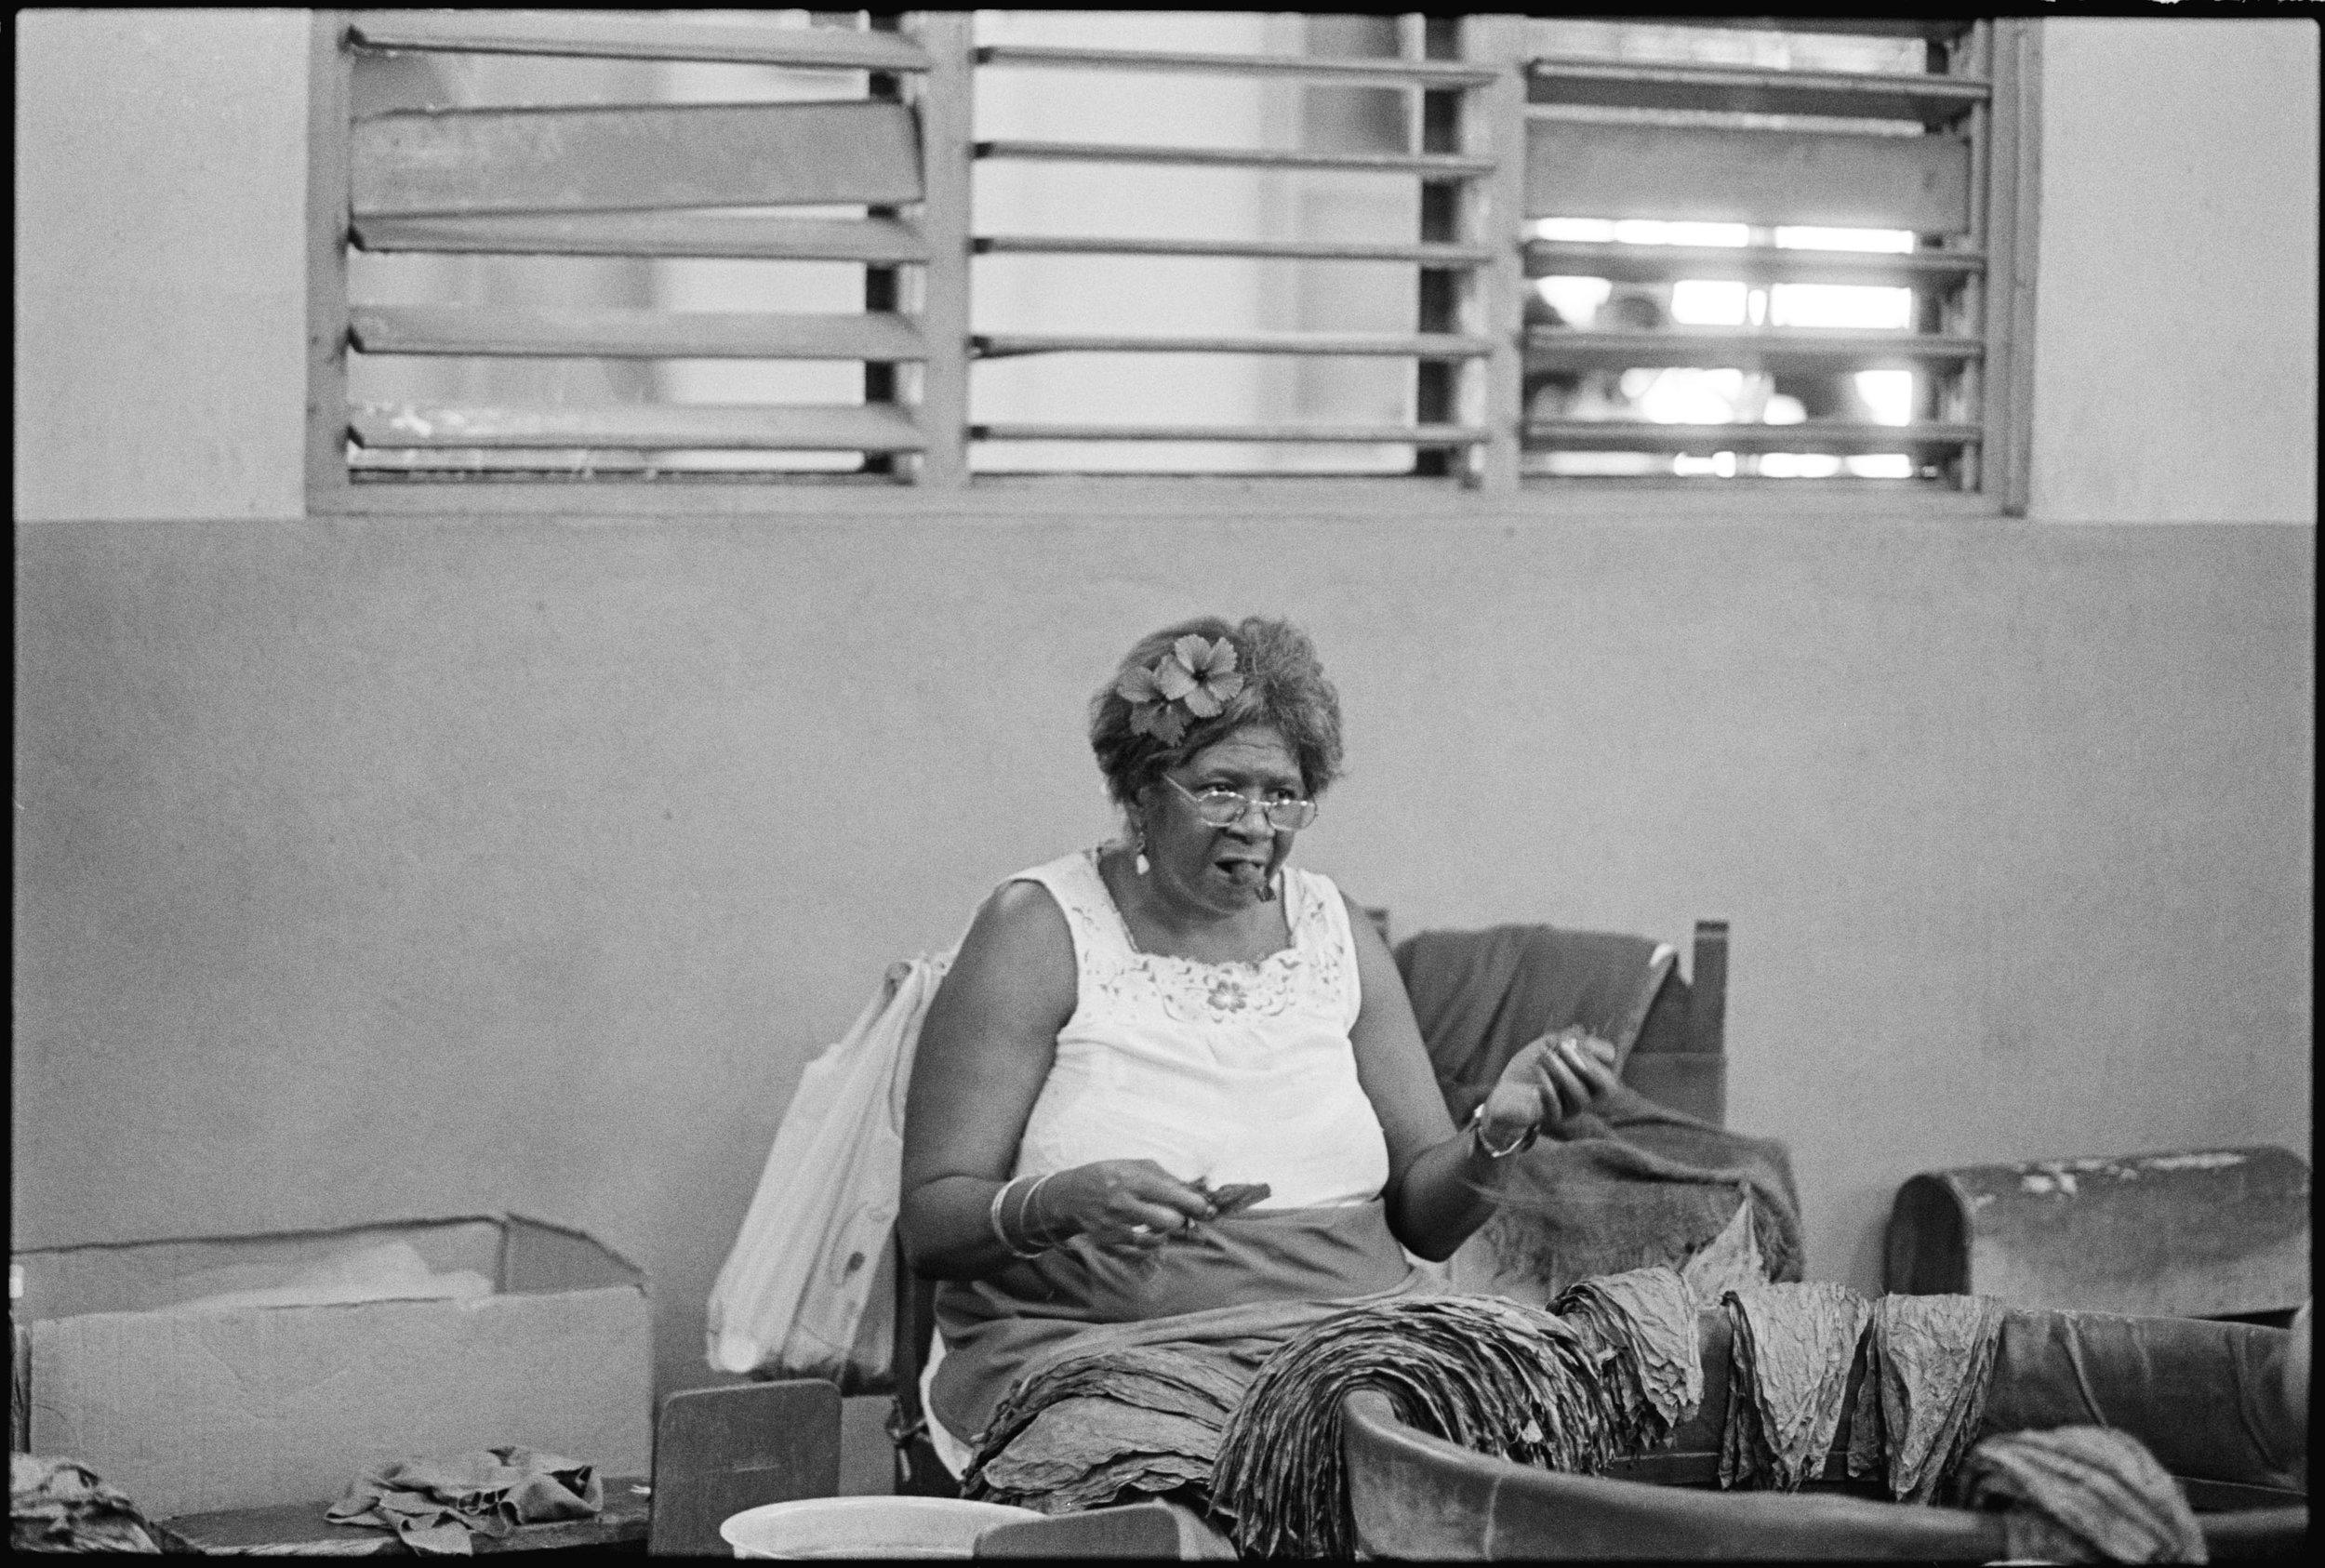 CUBA_HAVANA_2A-21